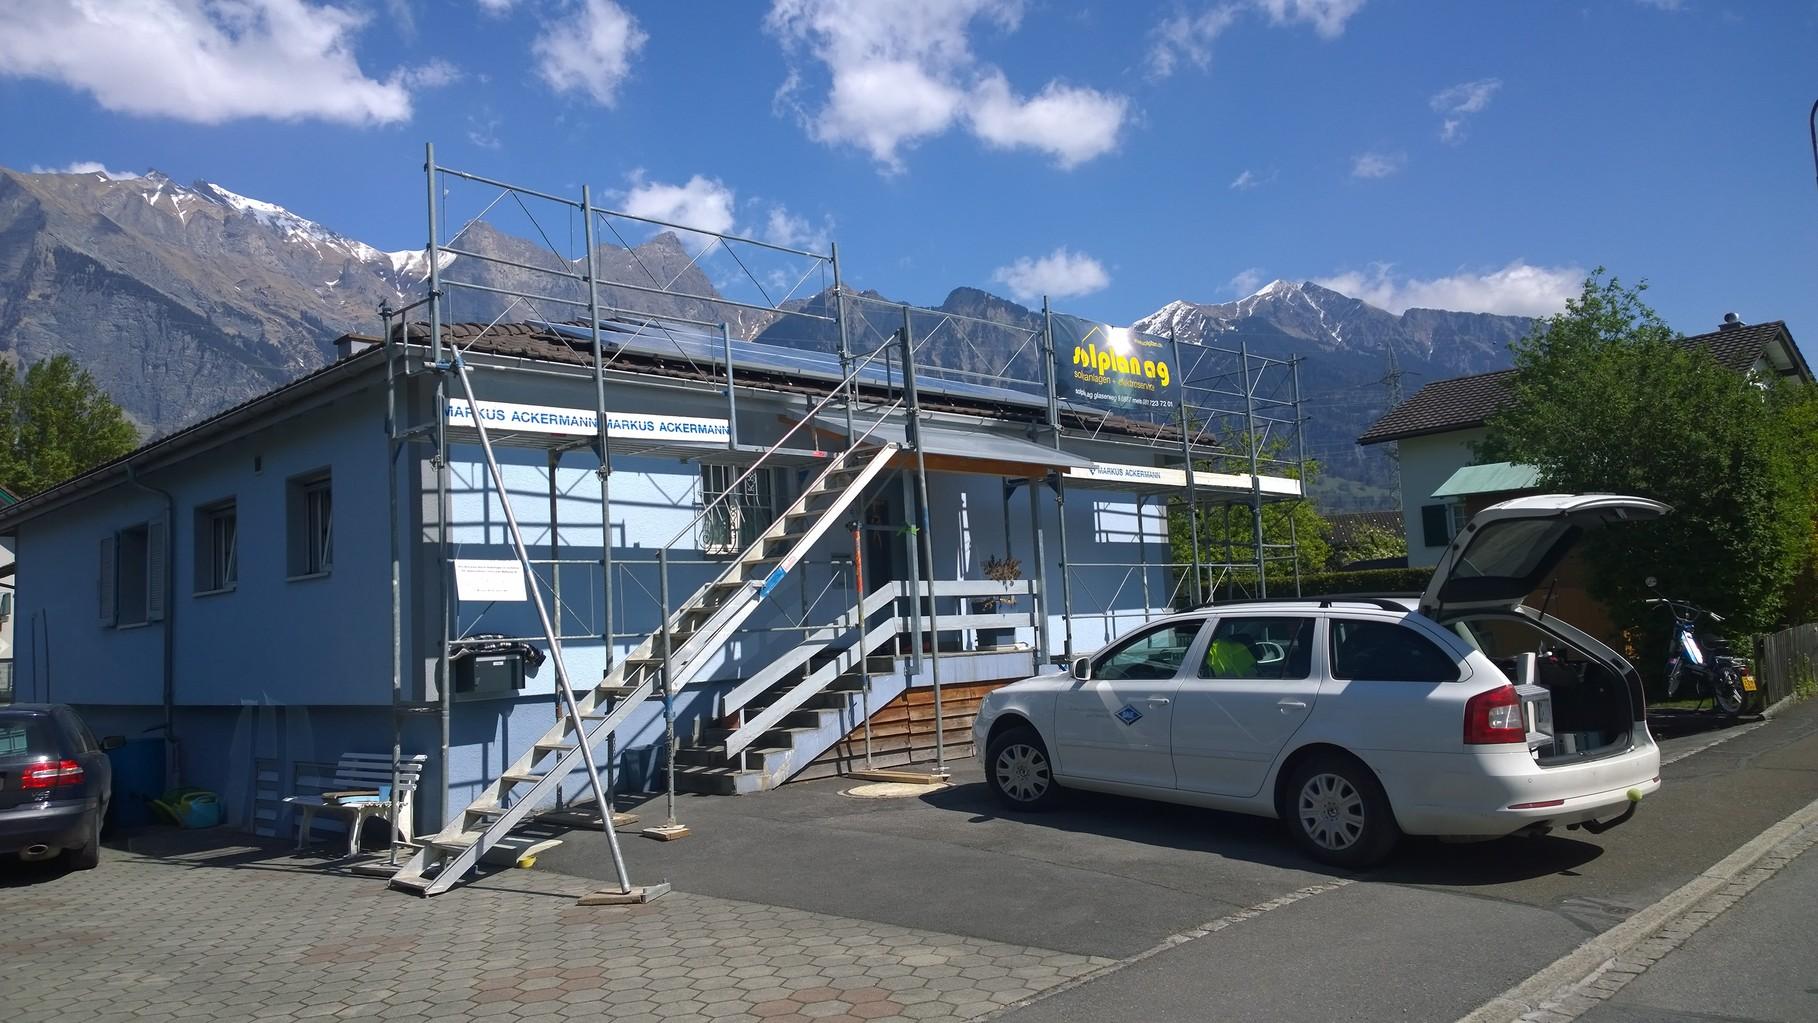 PV-Anlage 9kw in Bad Ragaz. Modul: Yingli Panda 275 Monosol Unterbau: IBC Top-Fix 200